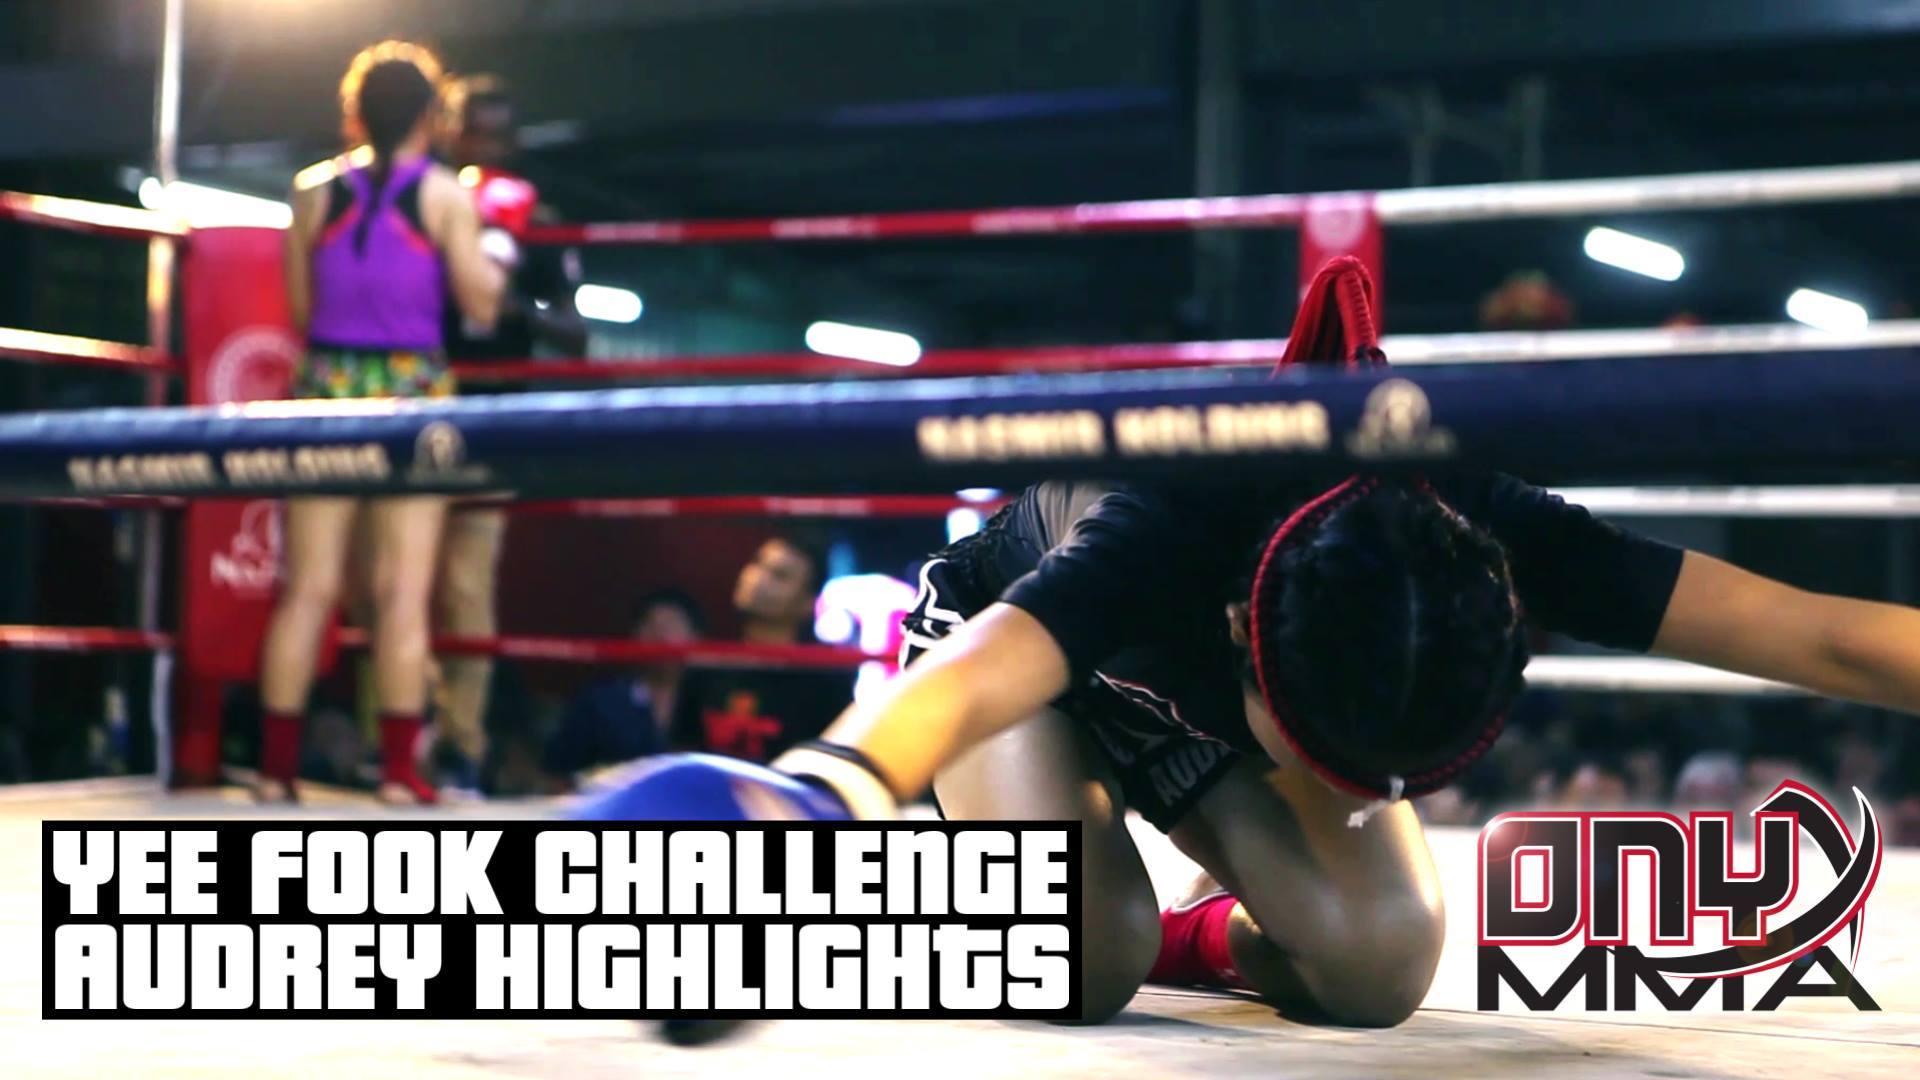 Yee Fook Challenge 2019 - Audrey Highlights